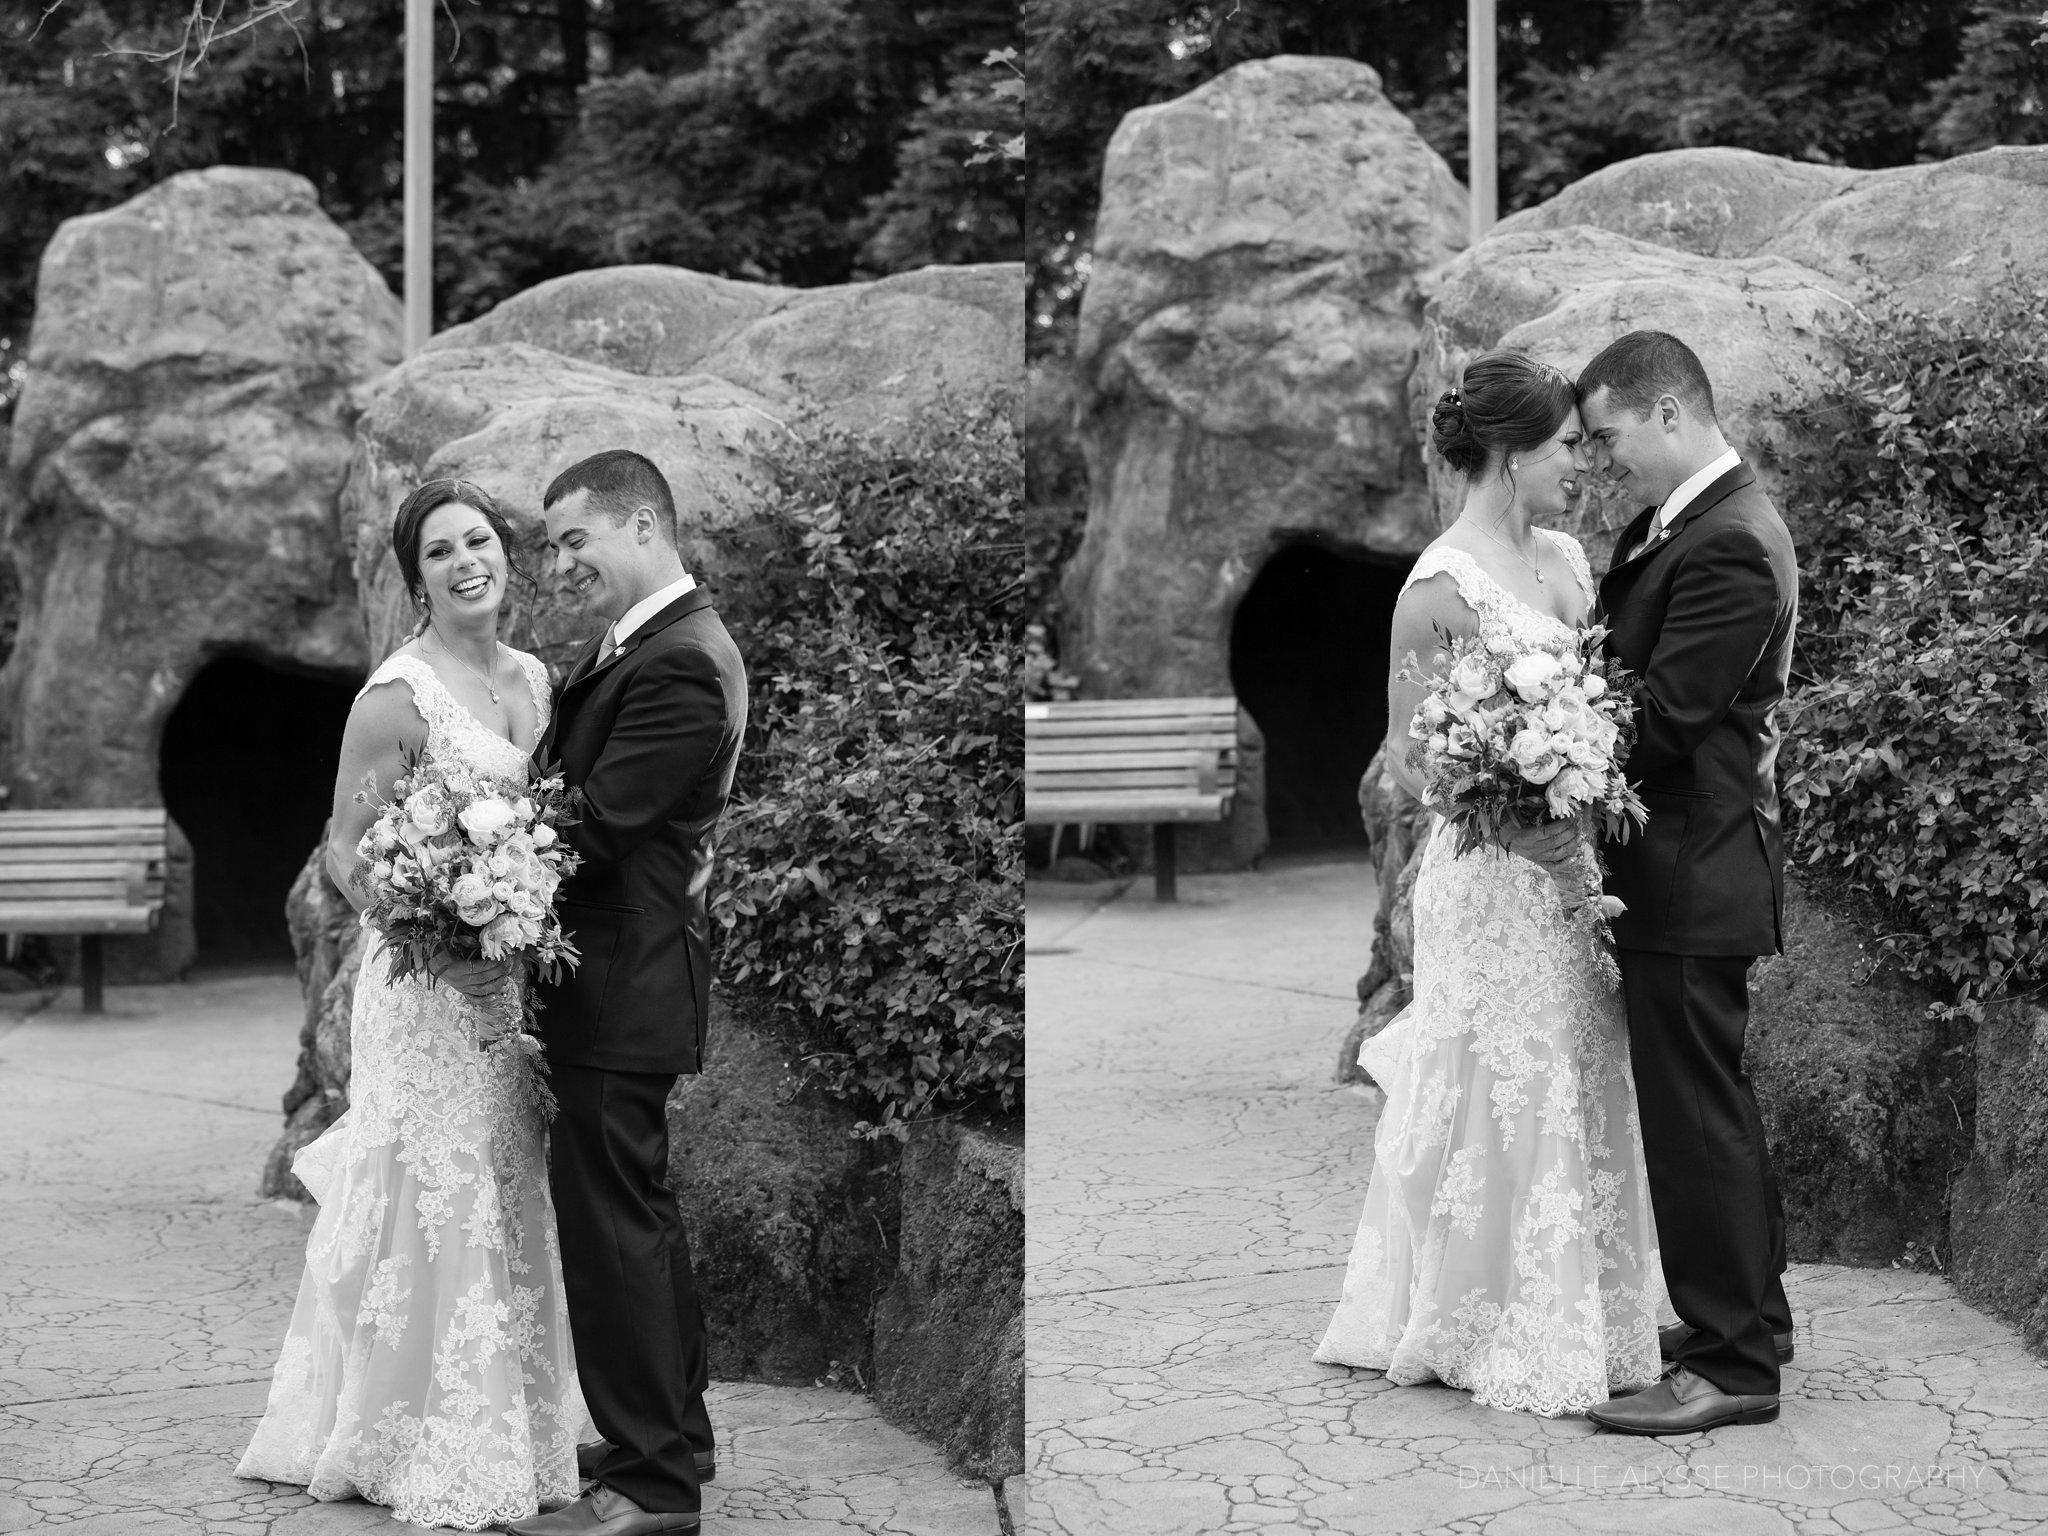 170429_blog_kimberly_ben_wedding_san_mateo_curiodyssey_danielle_alysse_photography_sacramento_photographer0384_WEB.jpg